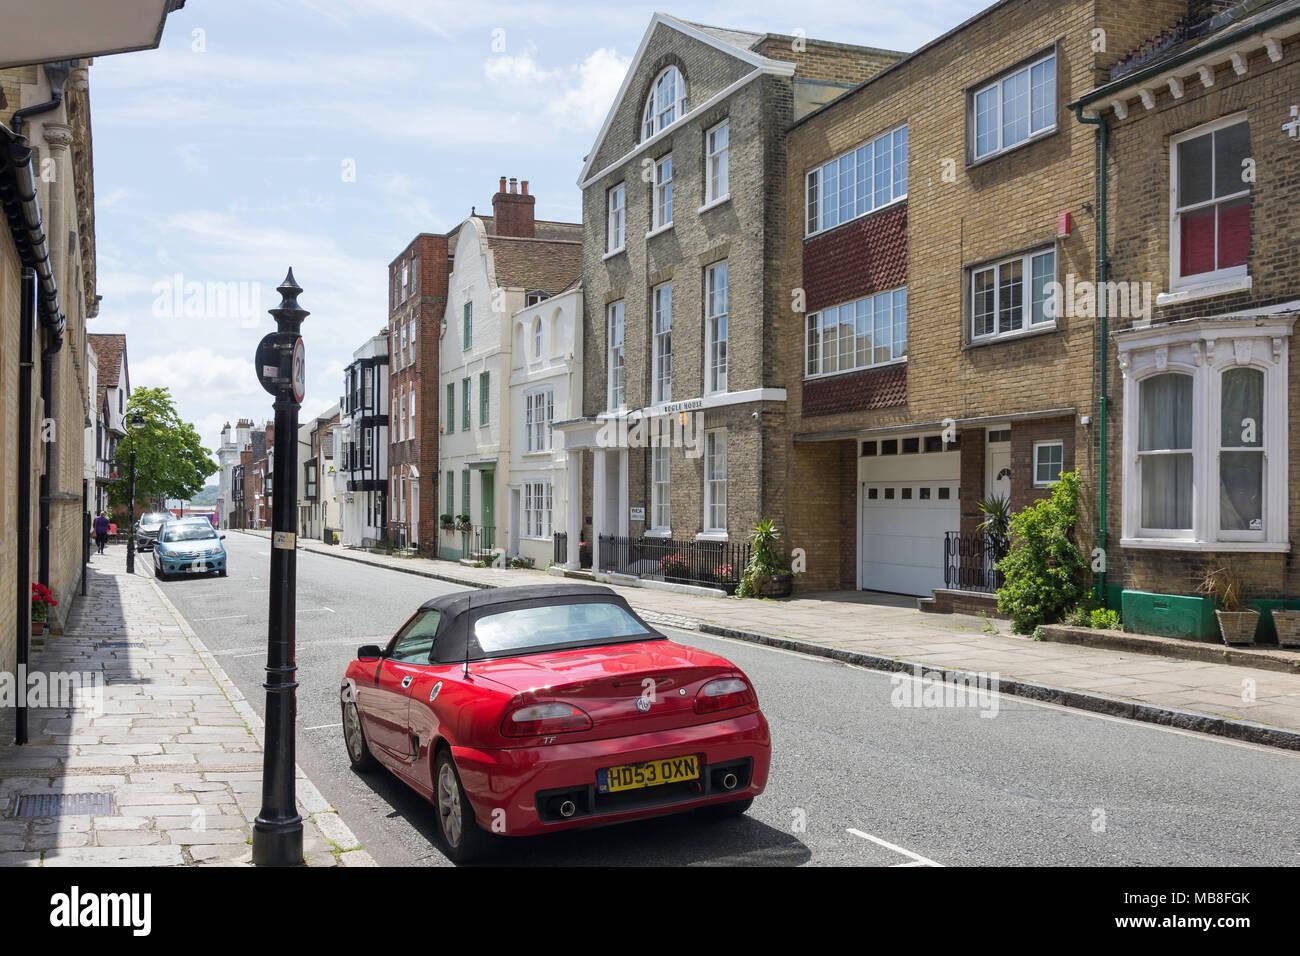 Bugle Street, Old Town, Southampton, Hampshire, England, United Kingdom - Stock Image